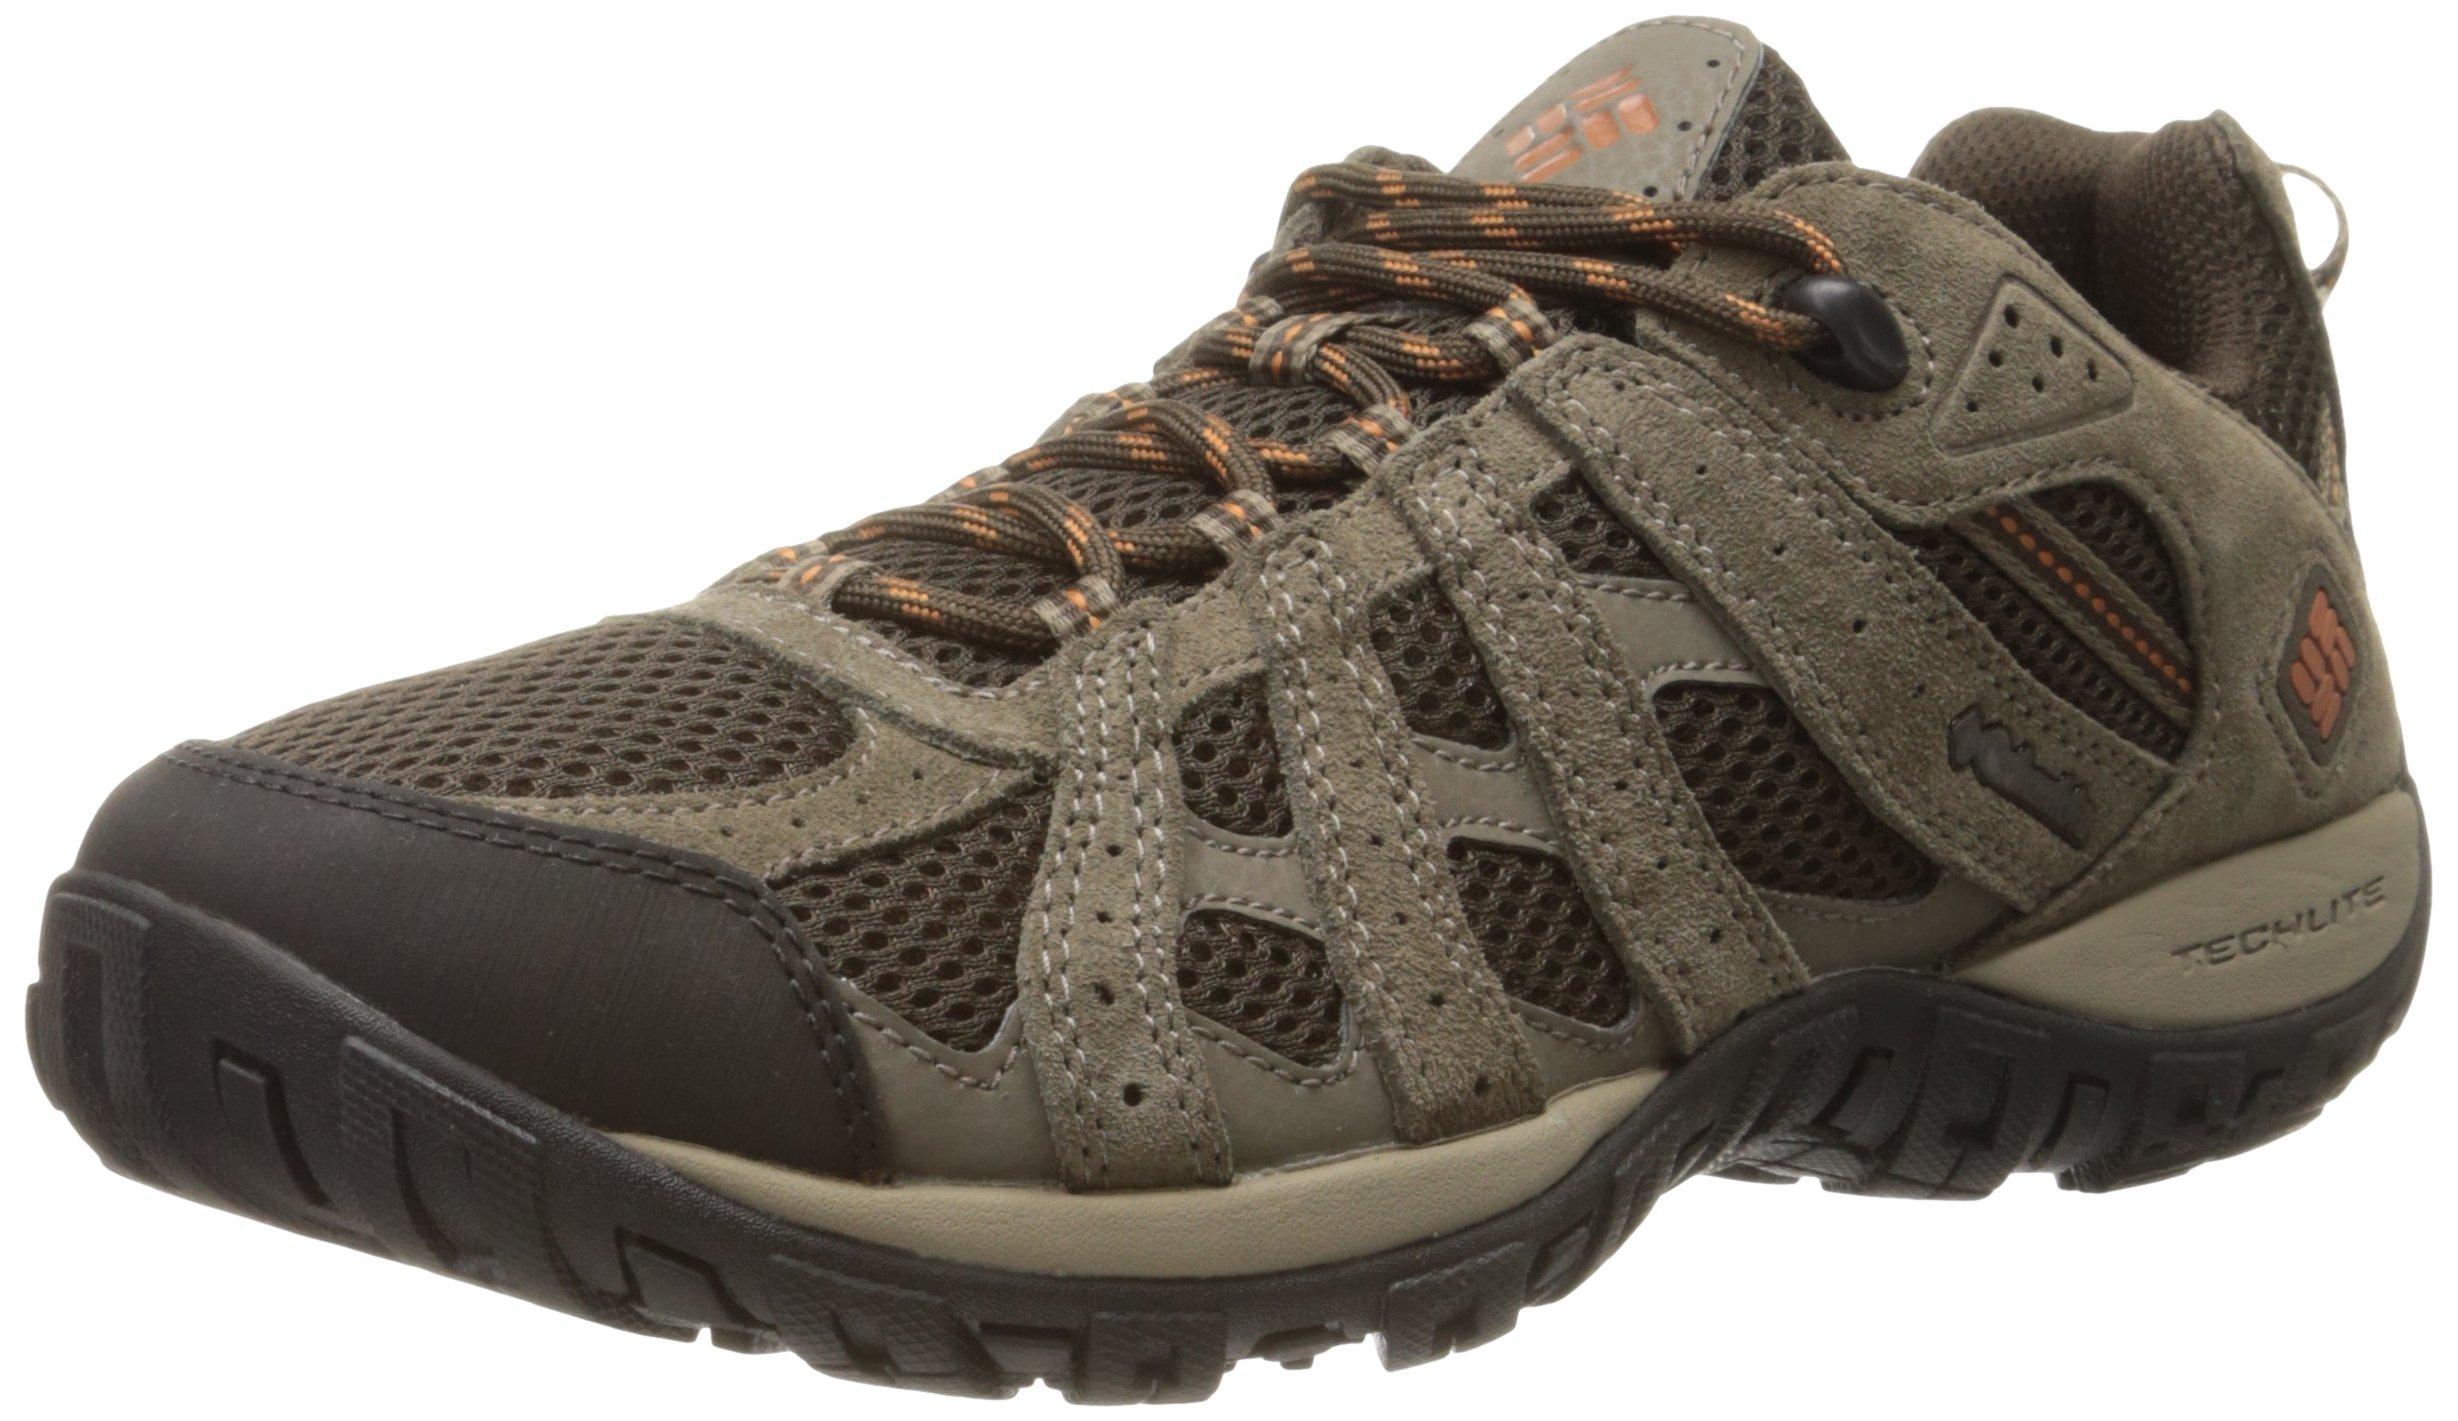 Columbia Men's Redmond Trail Shoe, Cordovan/Dark, 11.5 M US